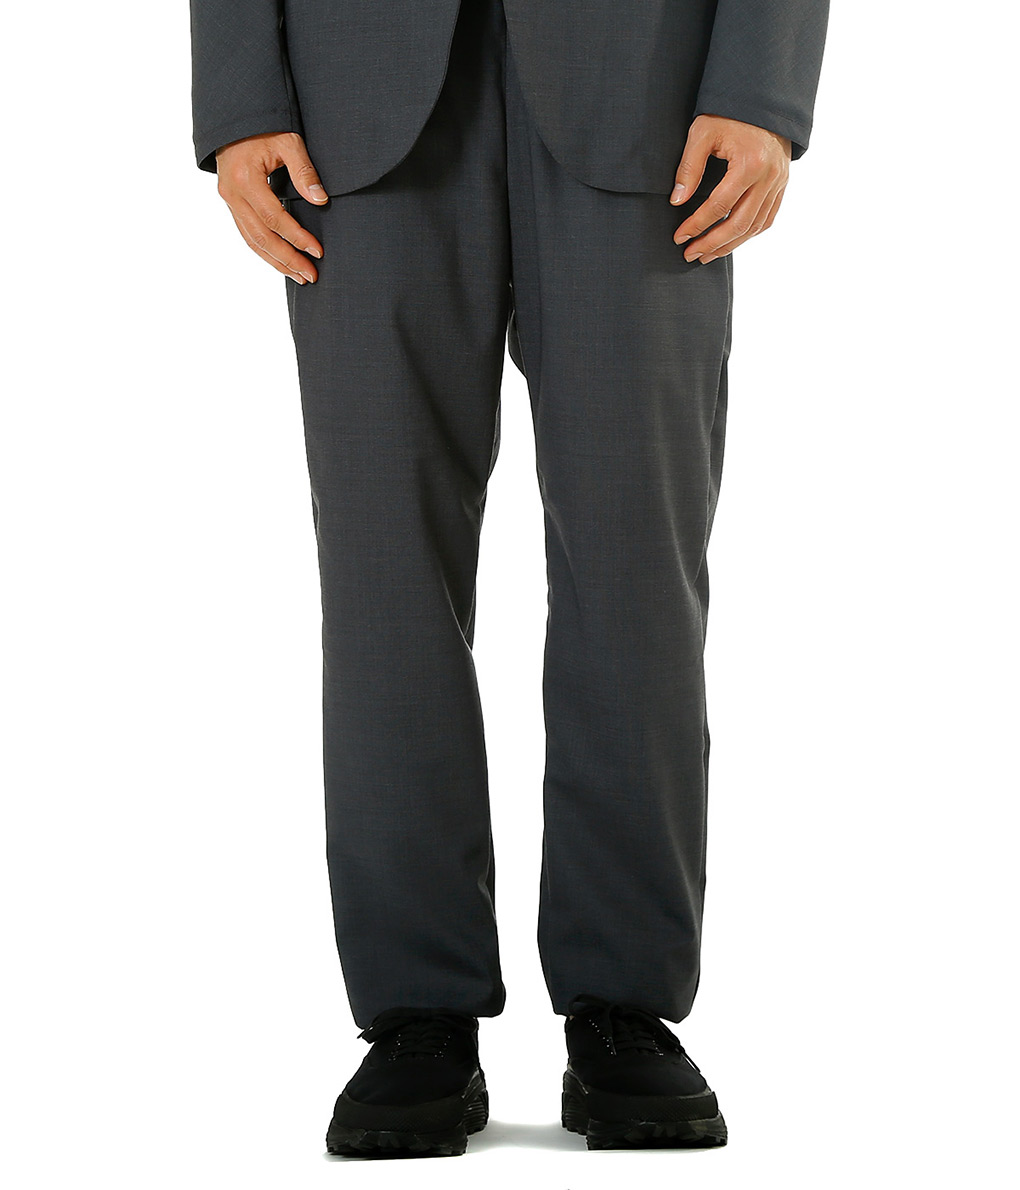 TEATORA / テアトラ : Wallet Pants OOL : ウォレット パンツ ボトムス テアトラ メンズ : TT-004-OOL-bjb 【BJB】